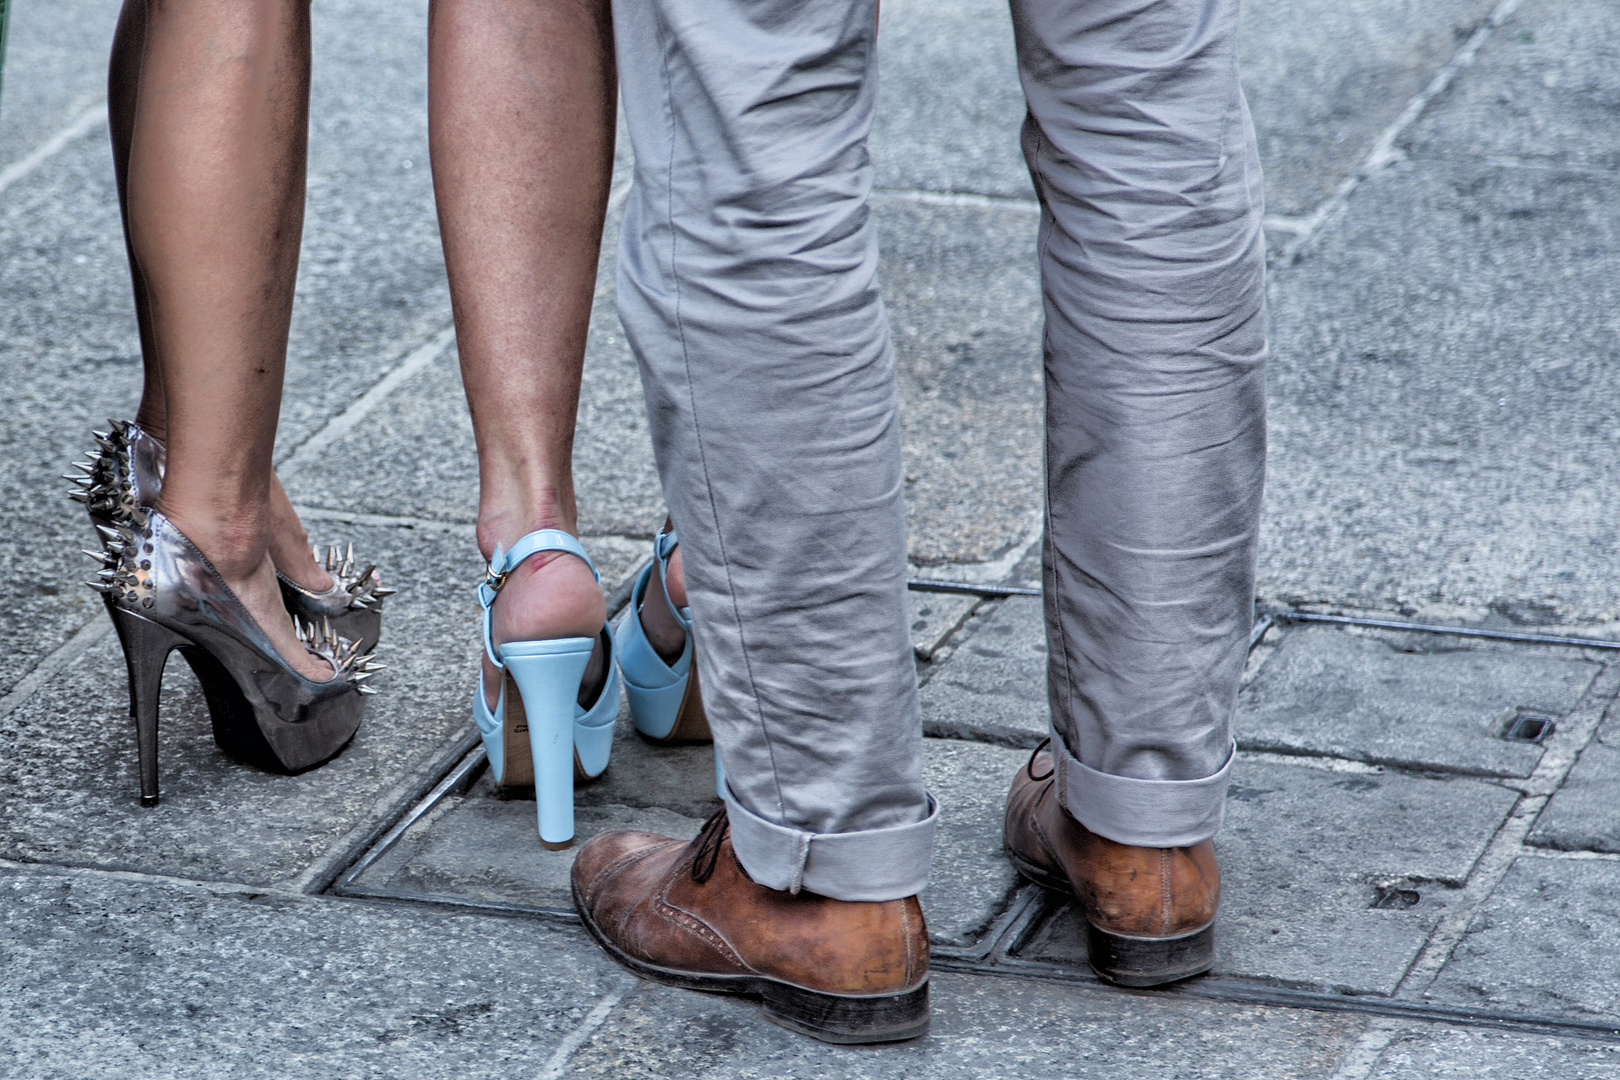 Schuhparade in Mailand